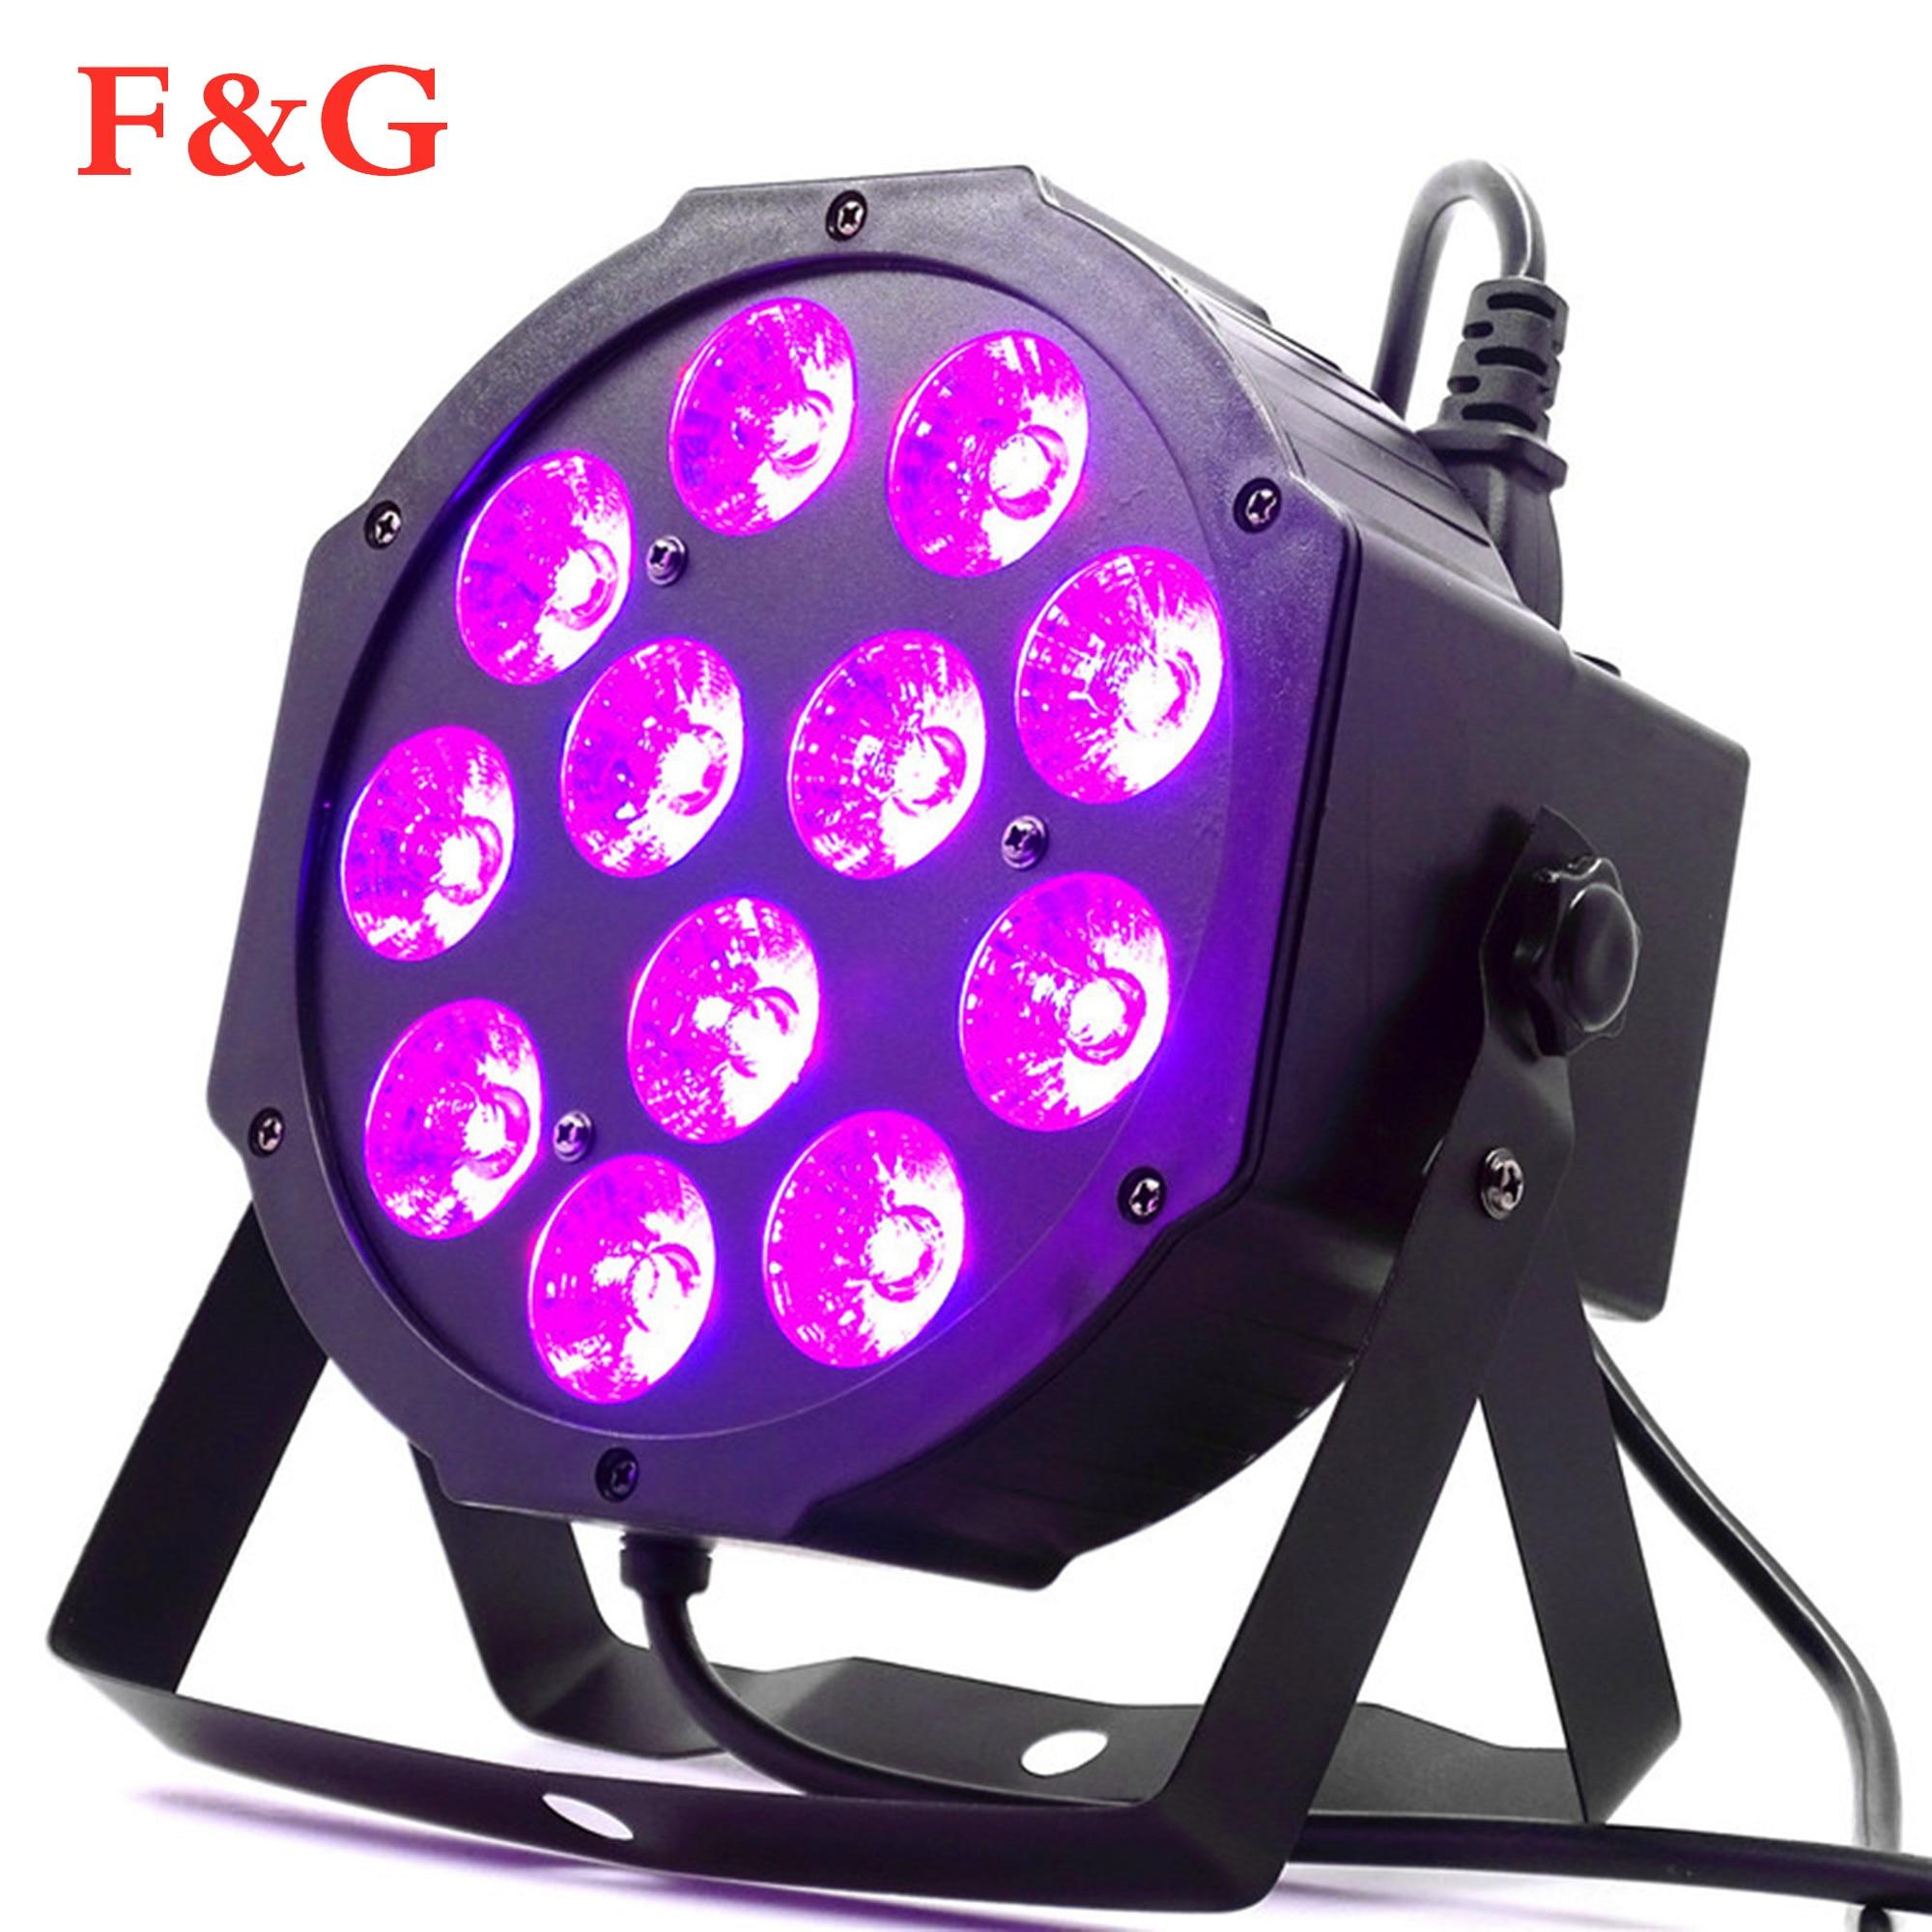 12x12W Led Par Verlichting 12pcs 12w Led Lamp Kralen RGBW 4in1 Flat Par Led Dmx512 Disco Professioneel Podium Dj Apparatuur